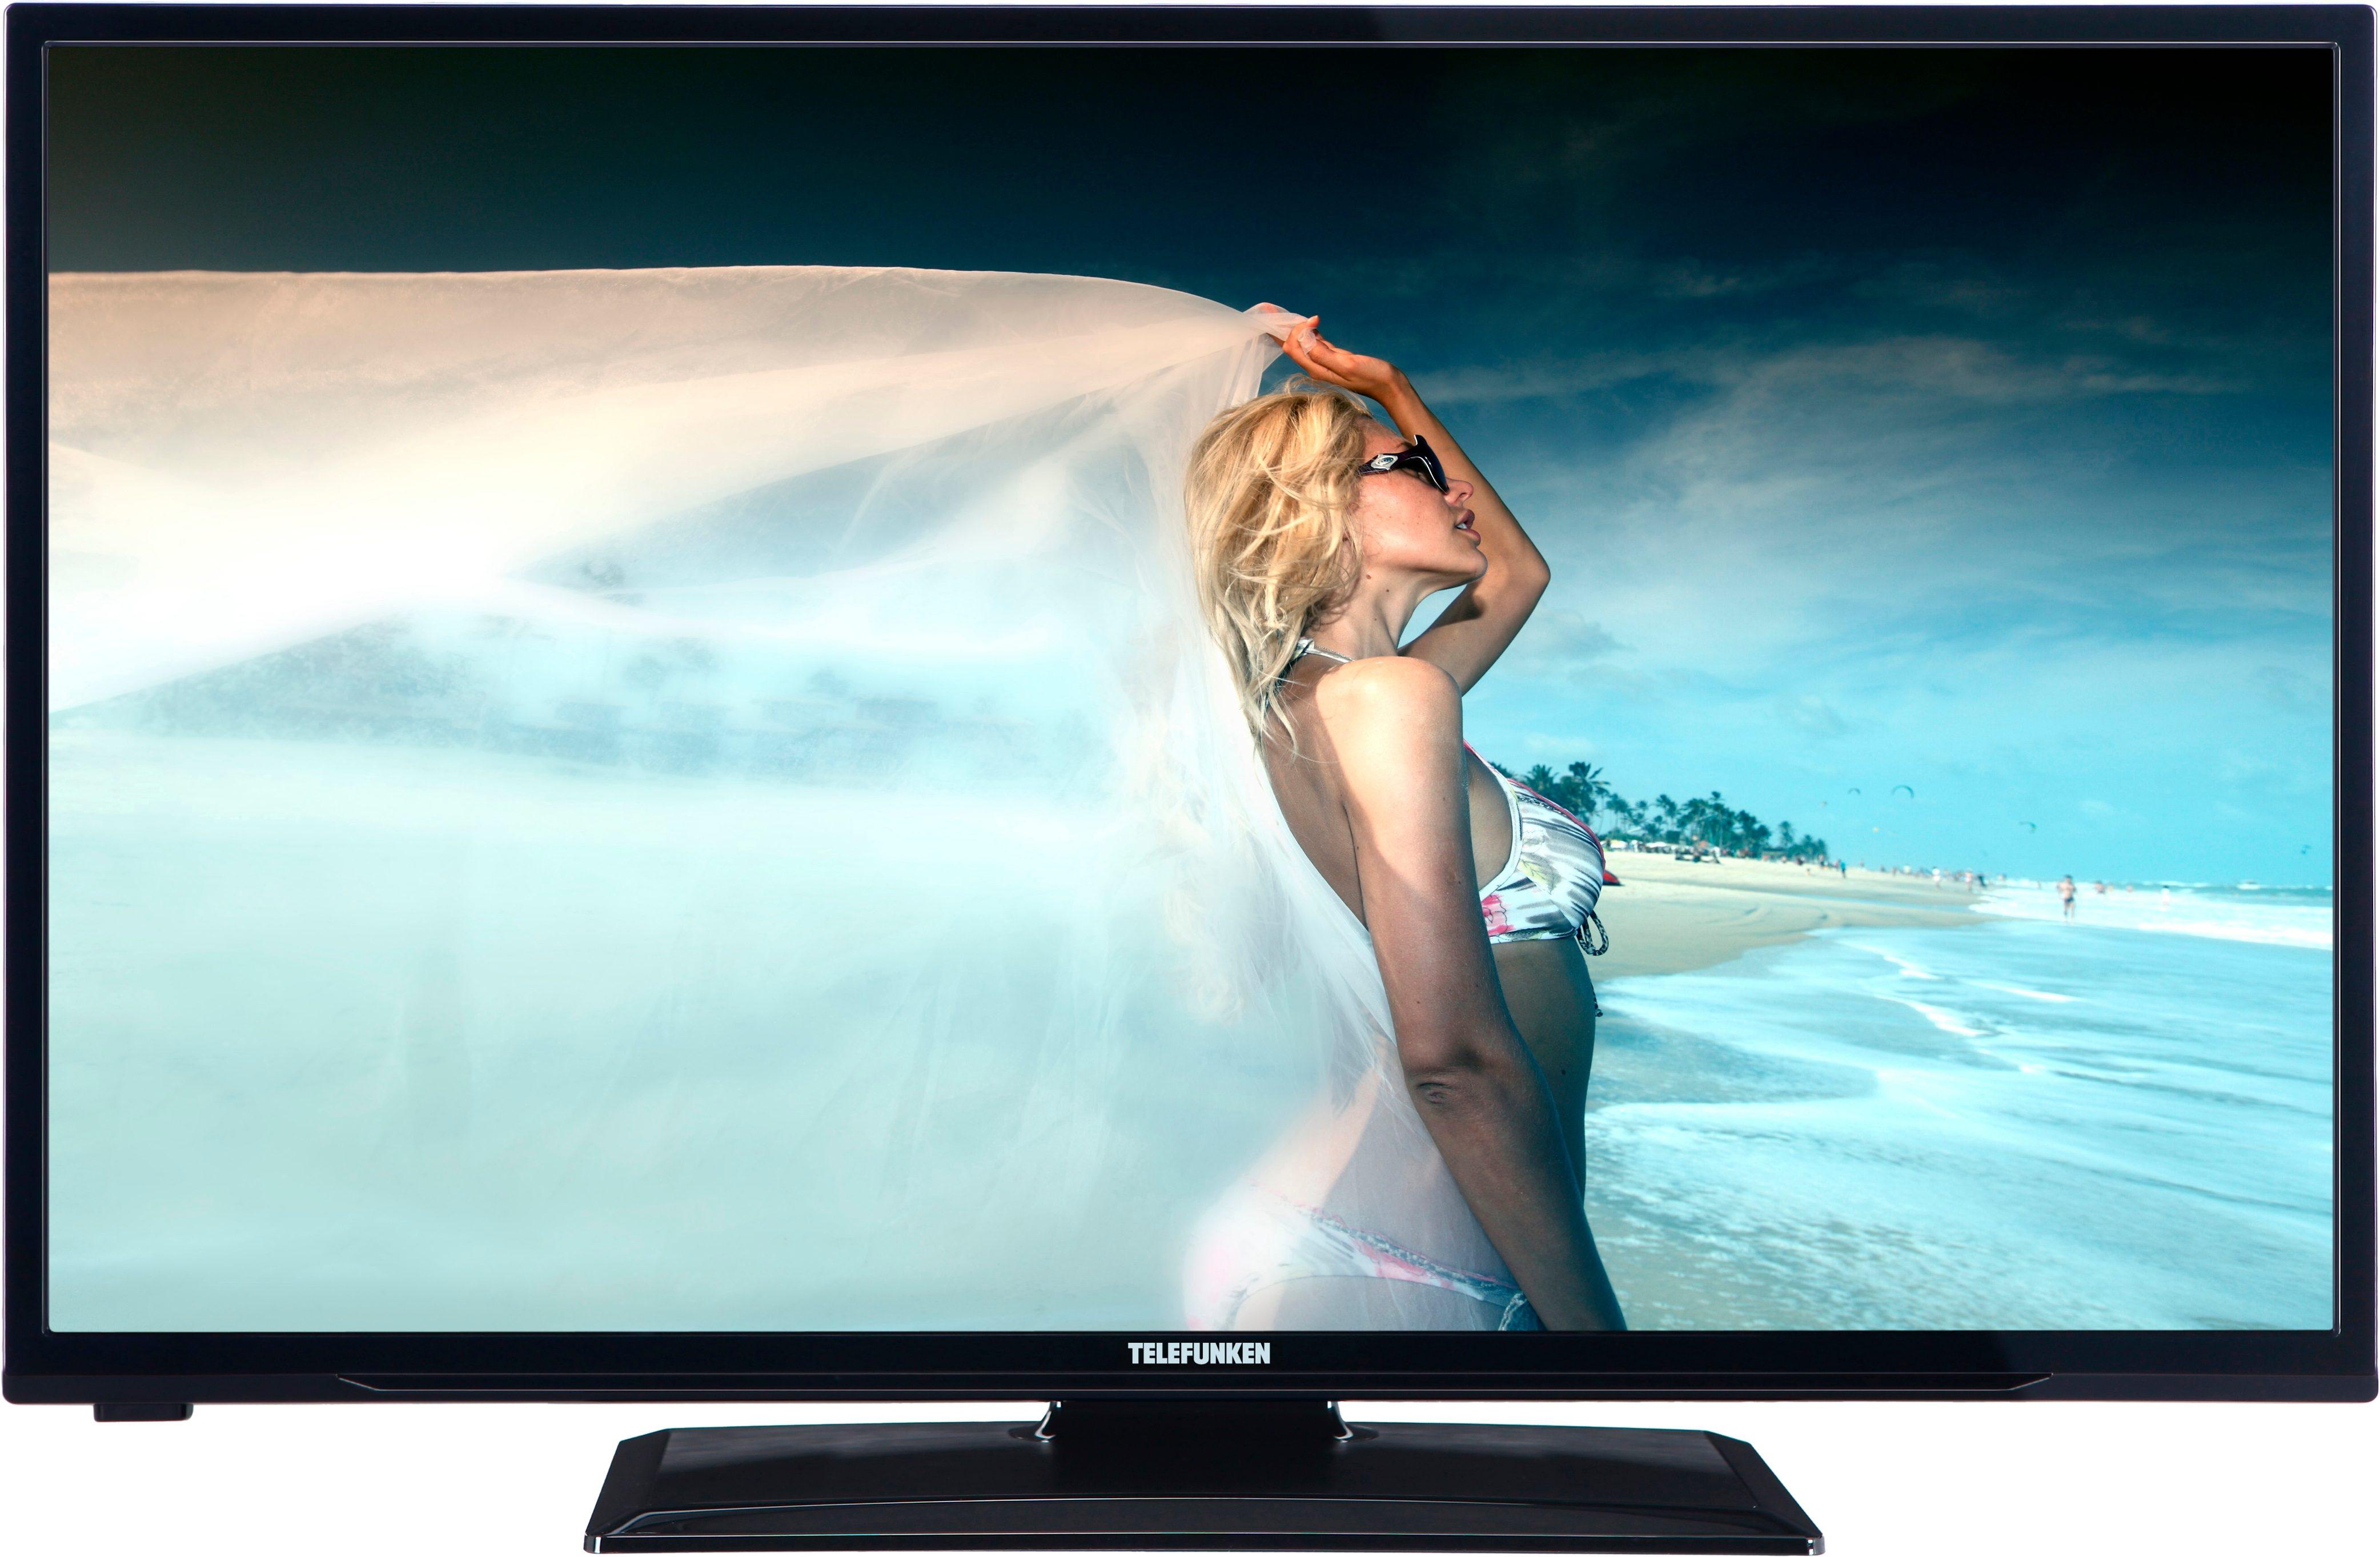 Telefunken D32H278M3, LED Fernseher, 81 cm (32 Zoll), HD-ready 720p